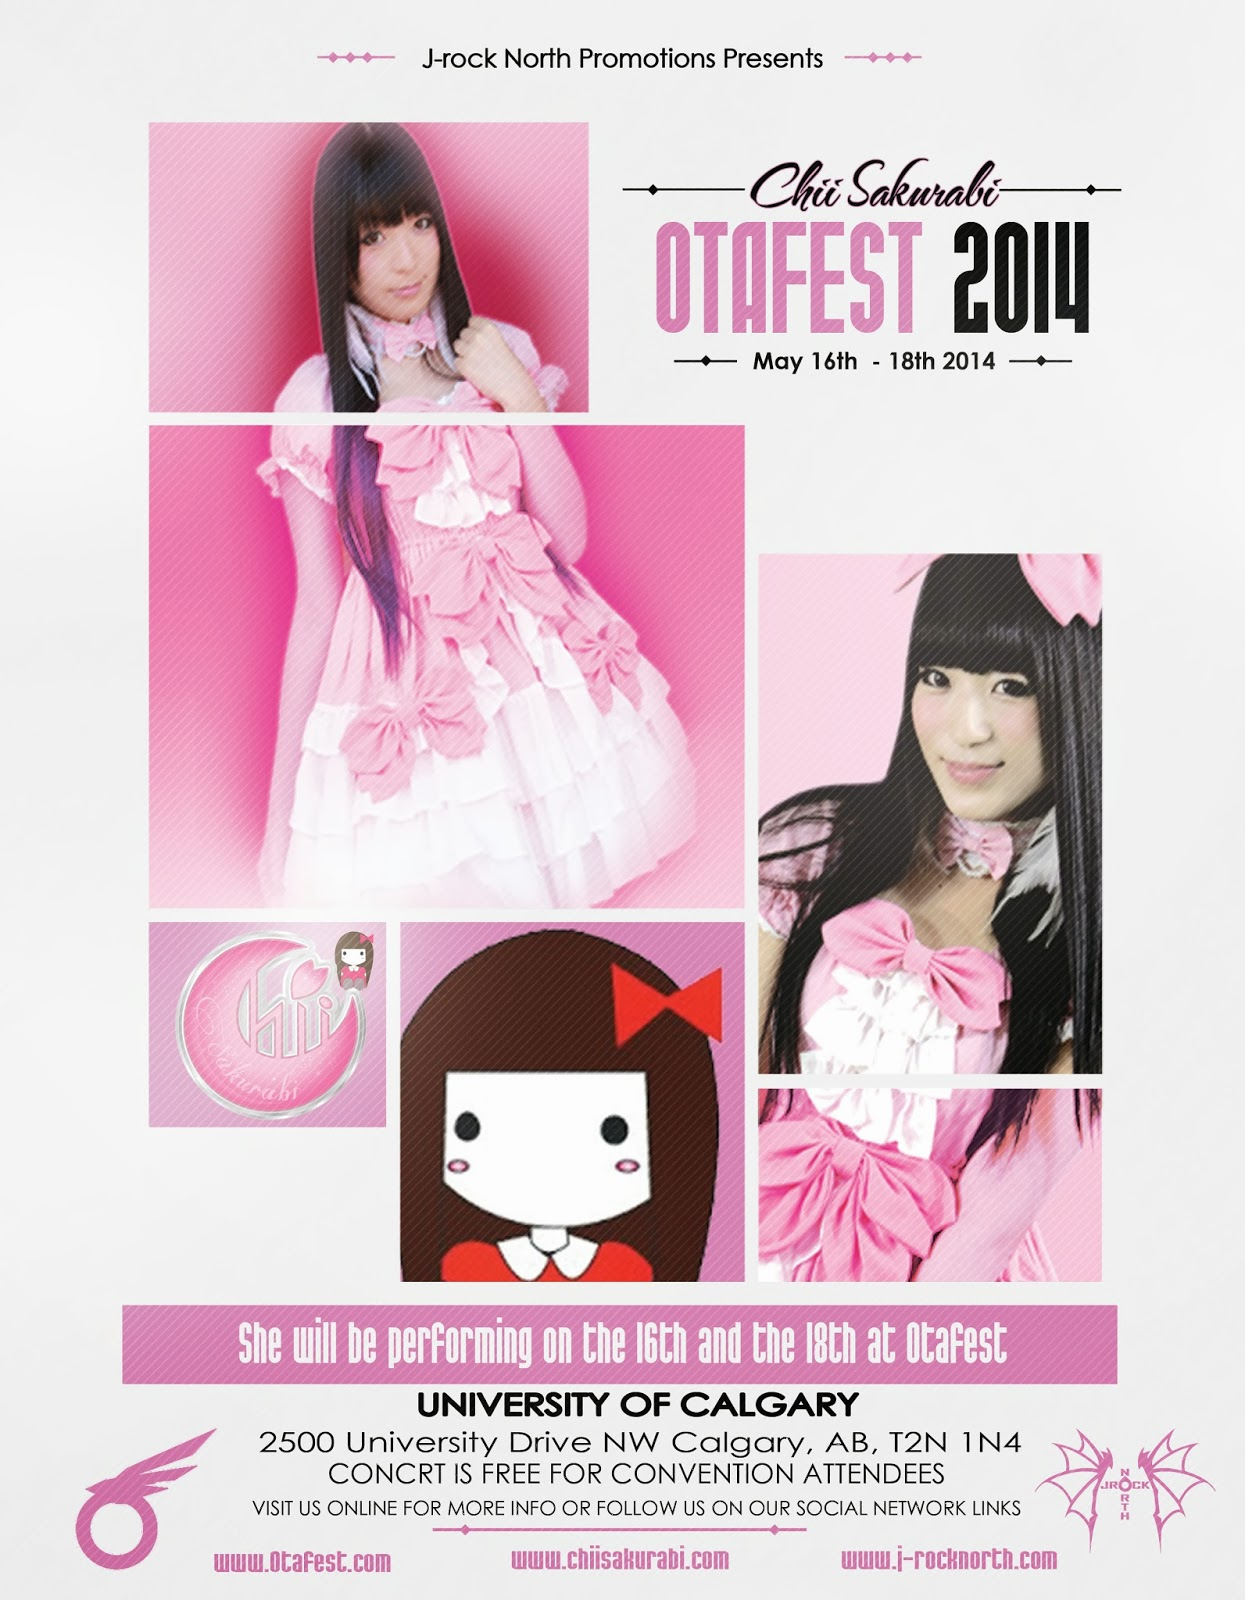 J-rock North Promotions Inc. Presents: Chii Sakurabi At Otafest 2014